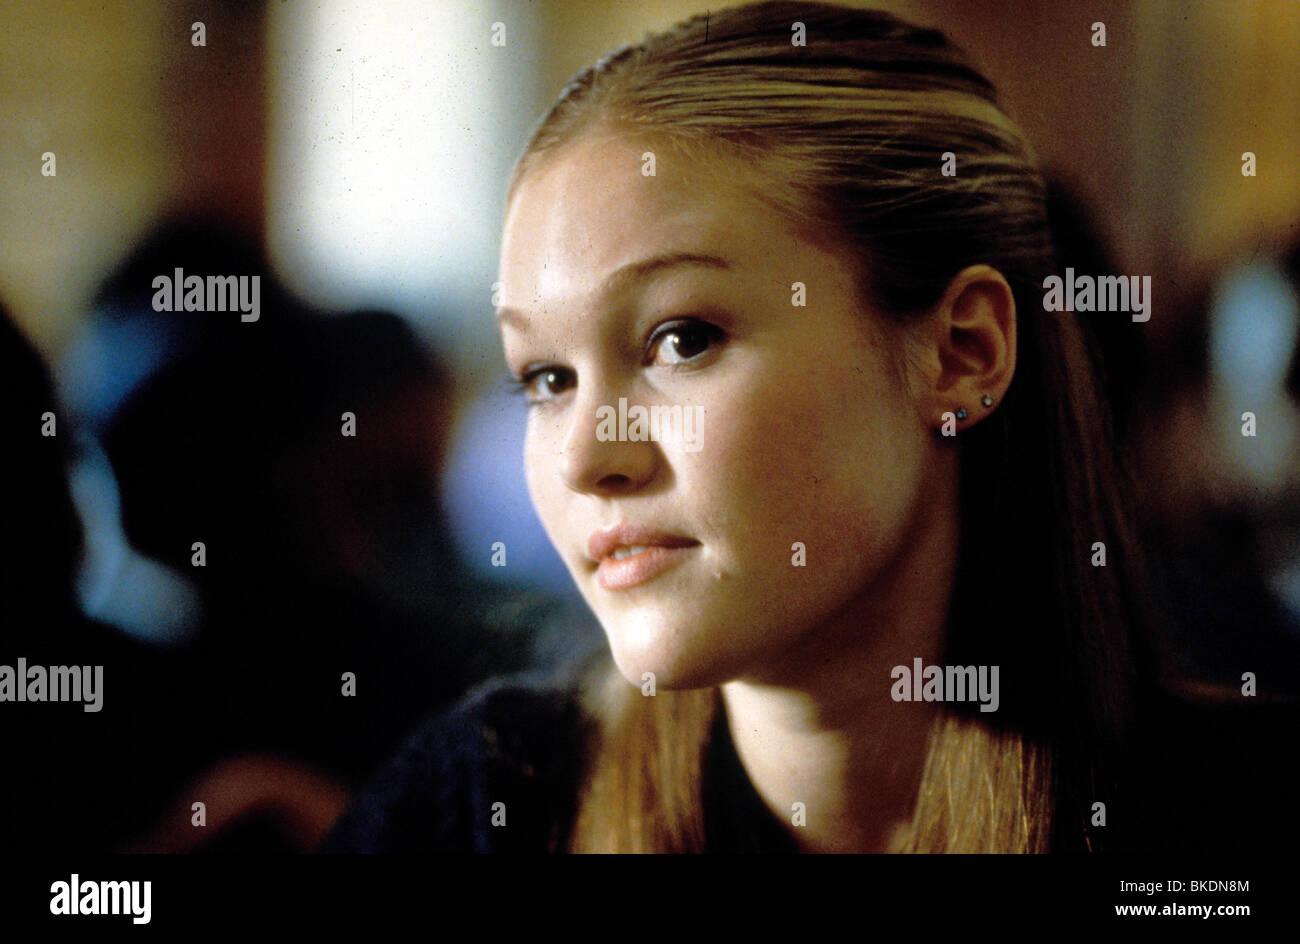 Save The Last Dance 2001 Julia Stiles Slsd 001 Stock Photo